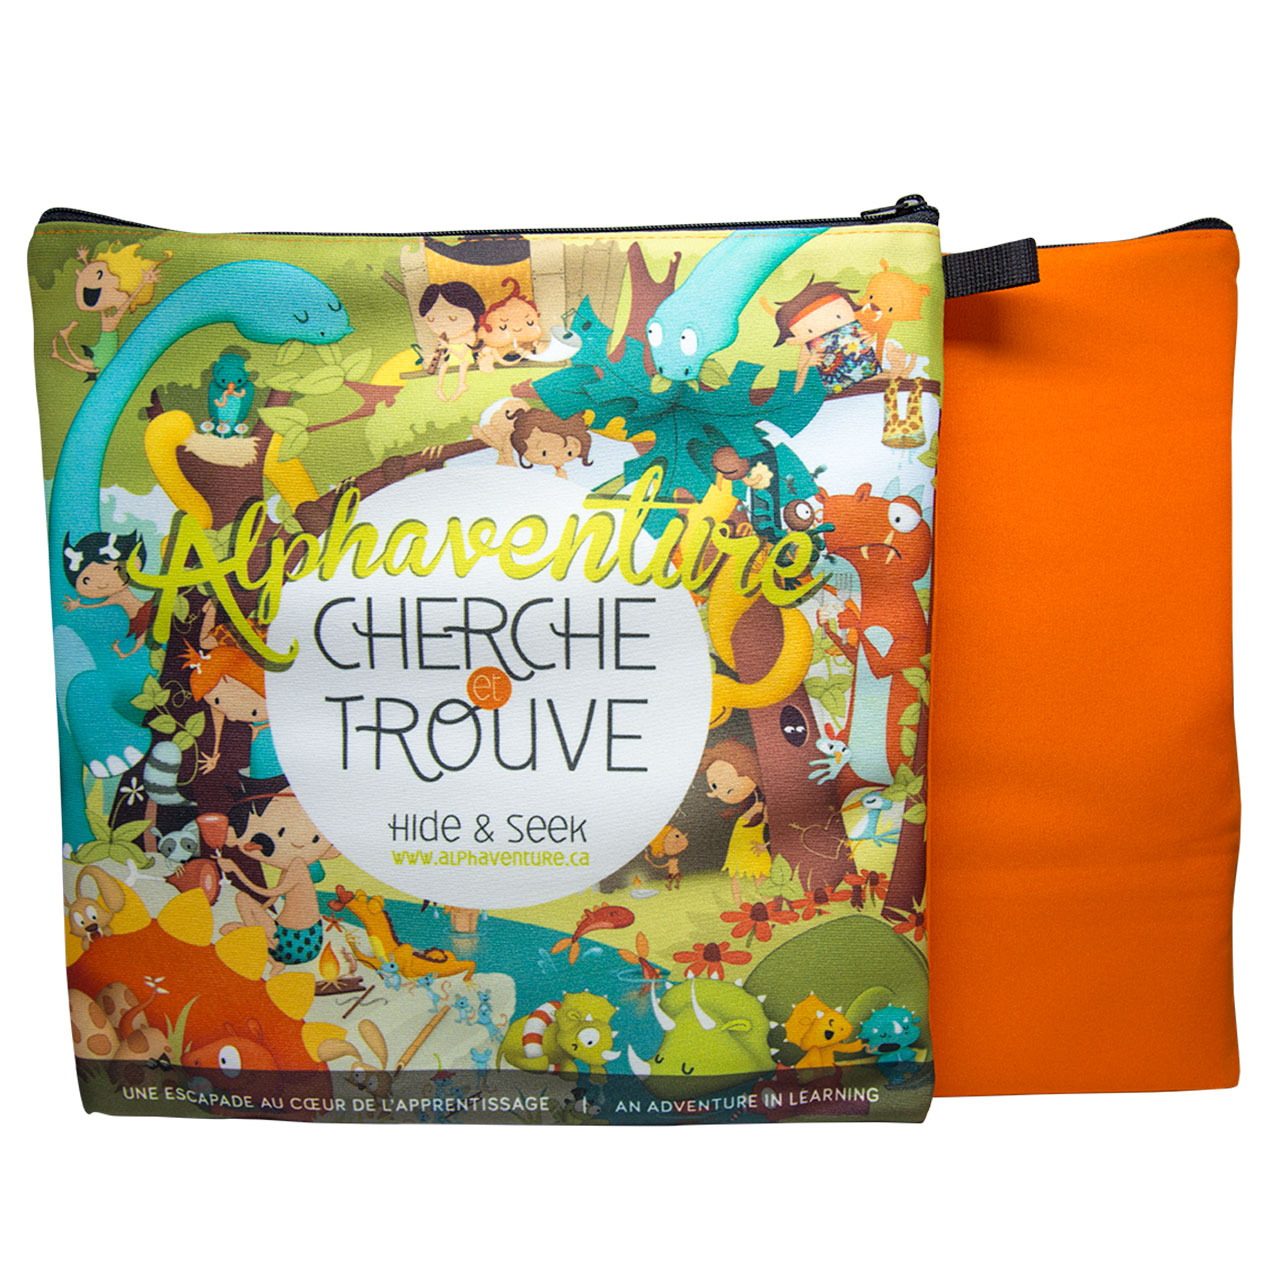 Alphaventure_Orange_pochette-avant-arriere